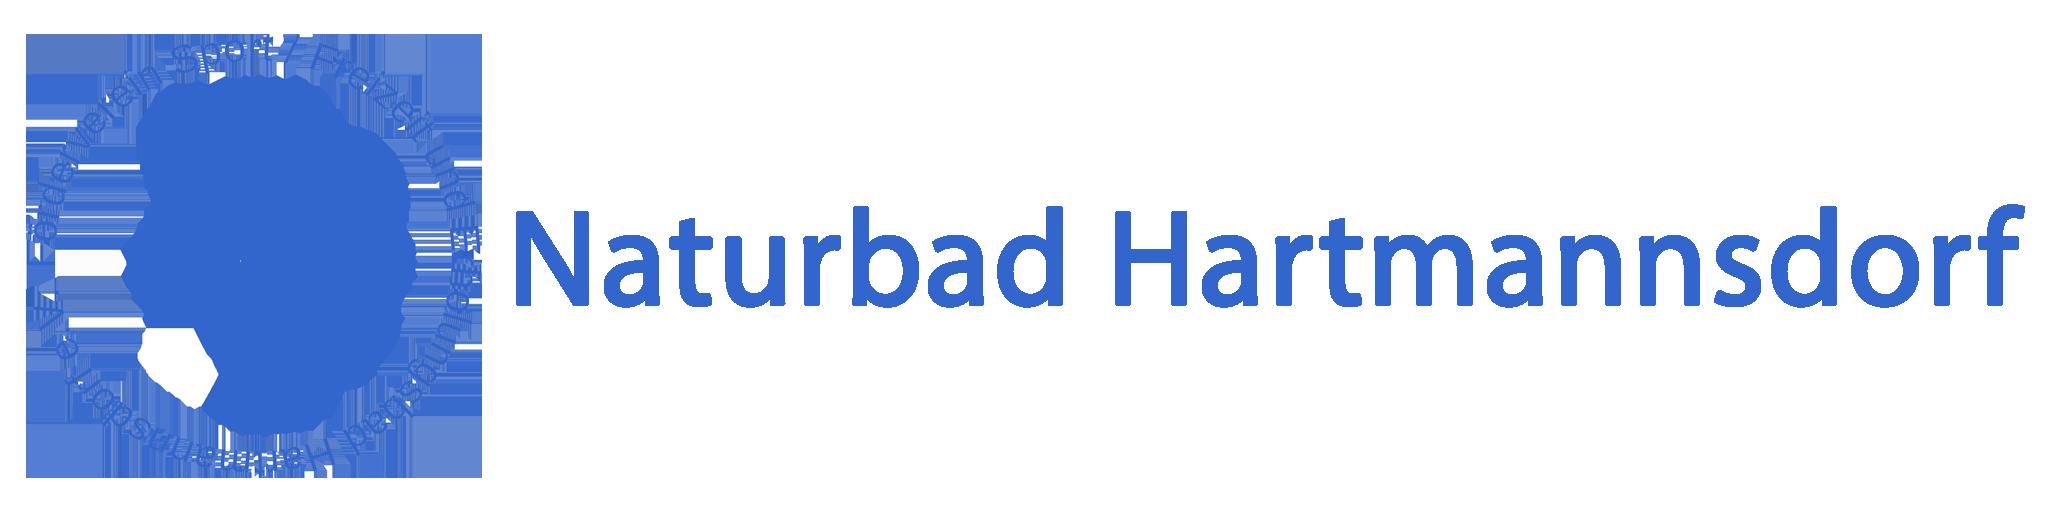 Naturbad Hartmannsdorf